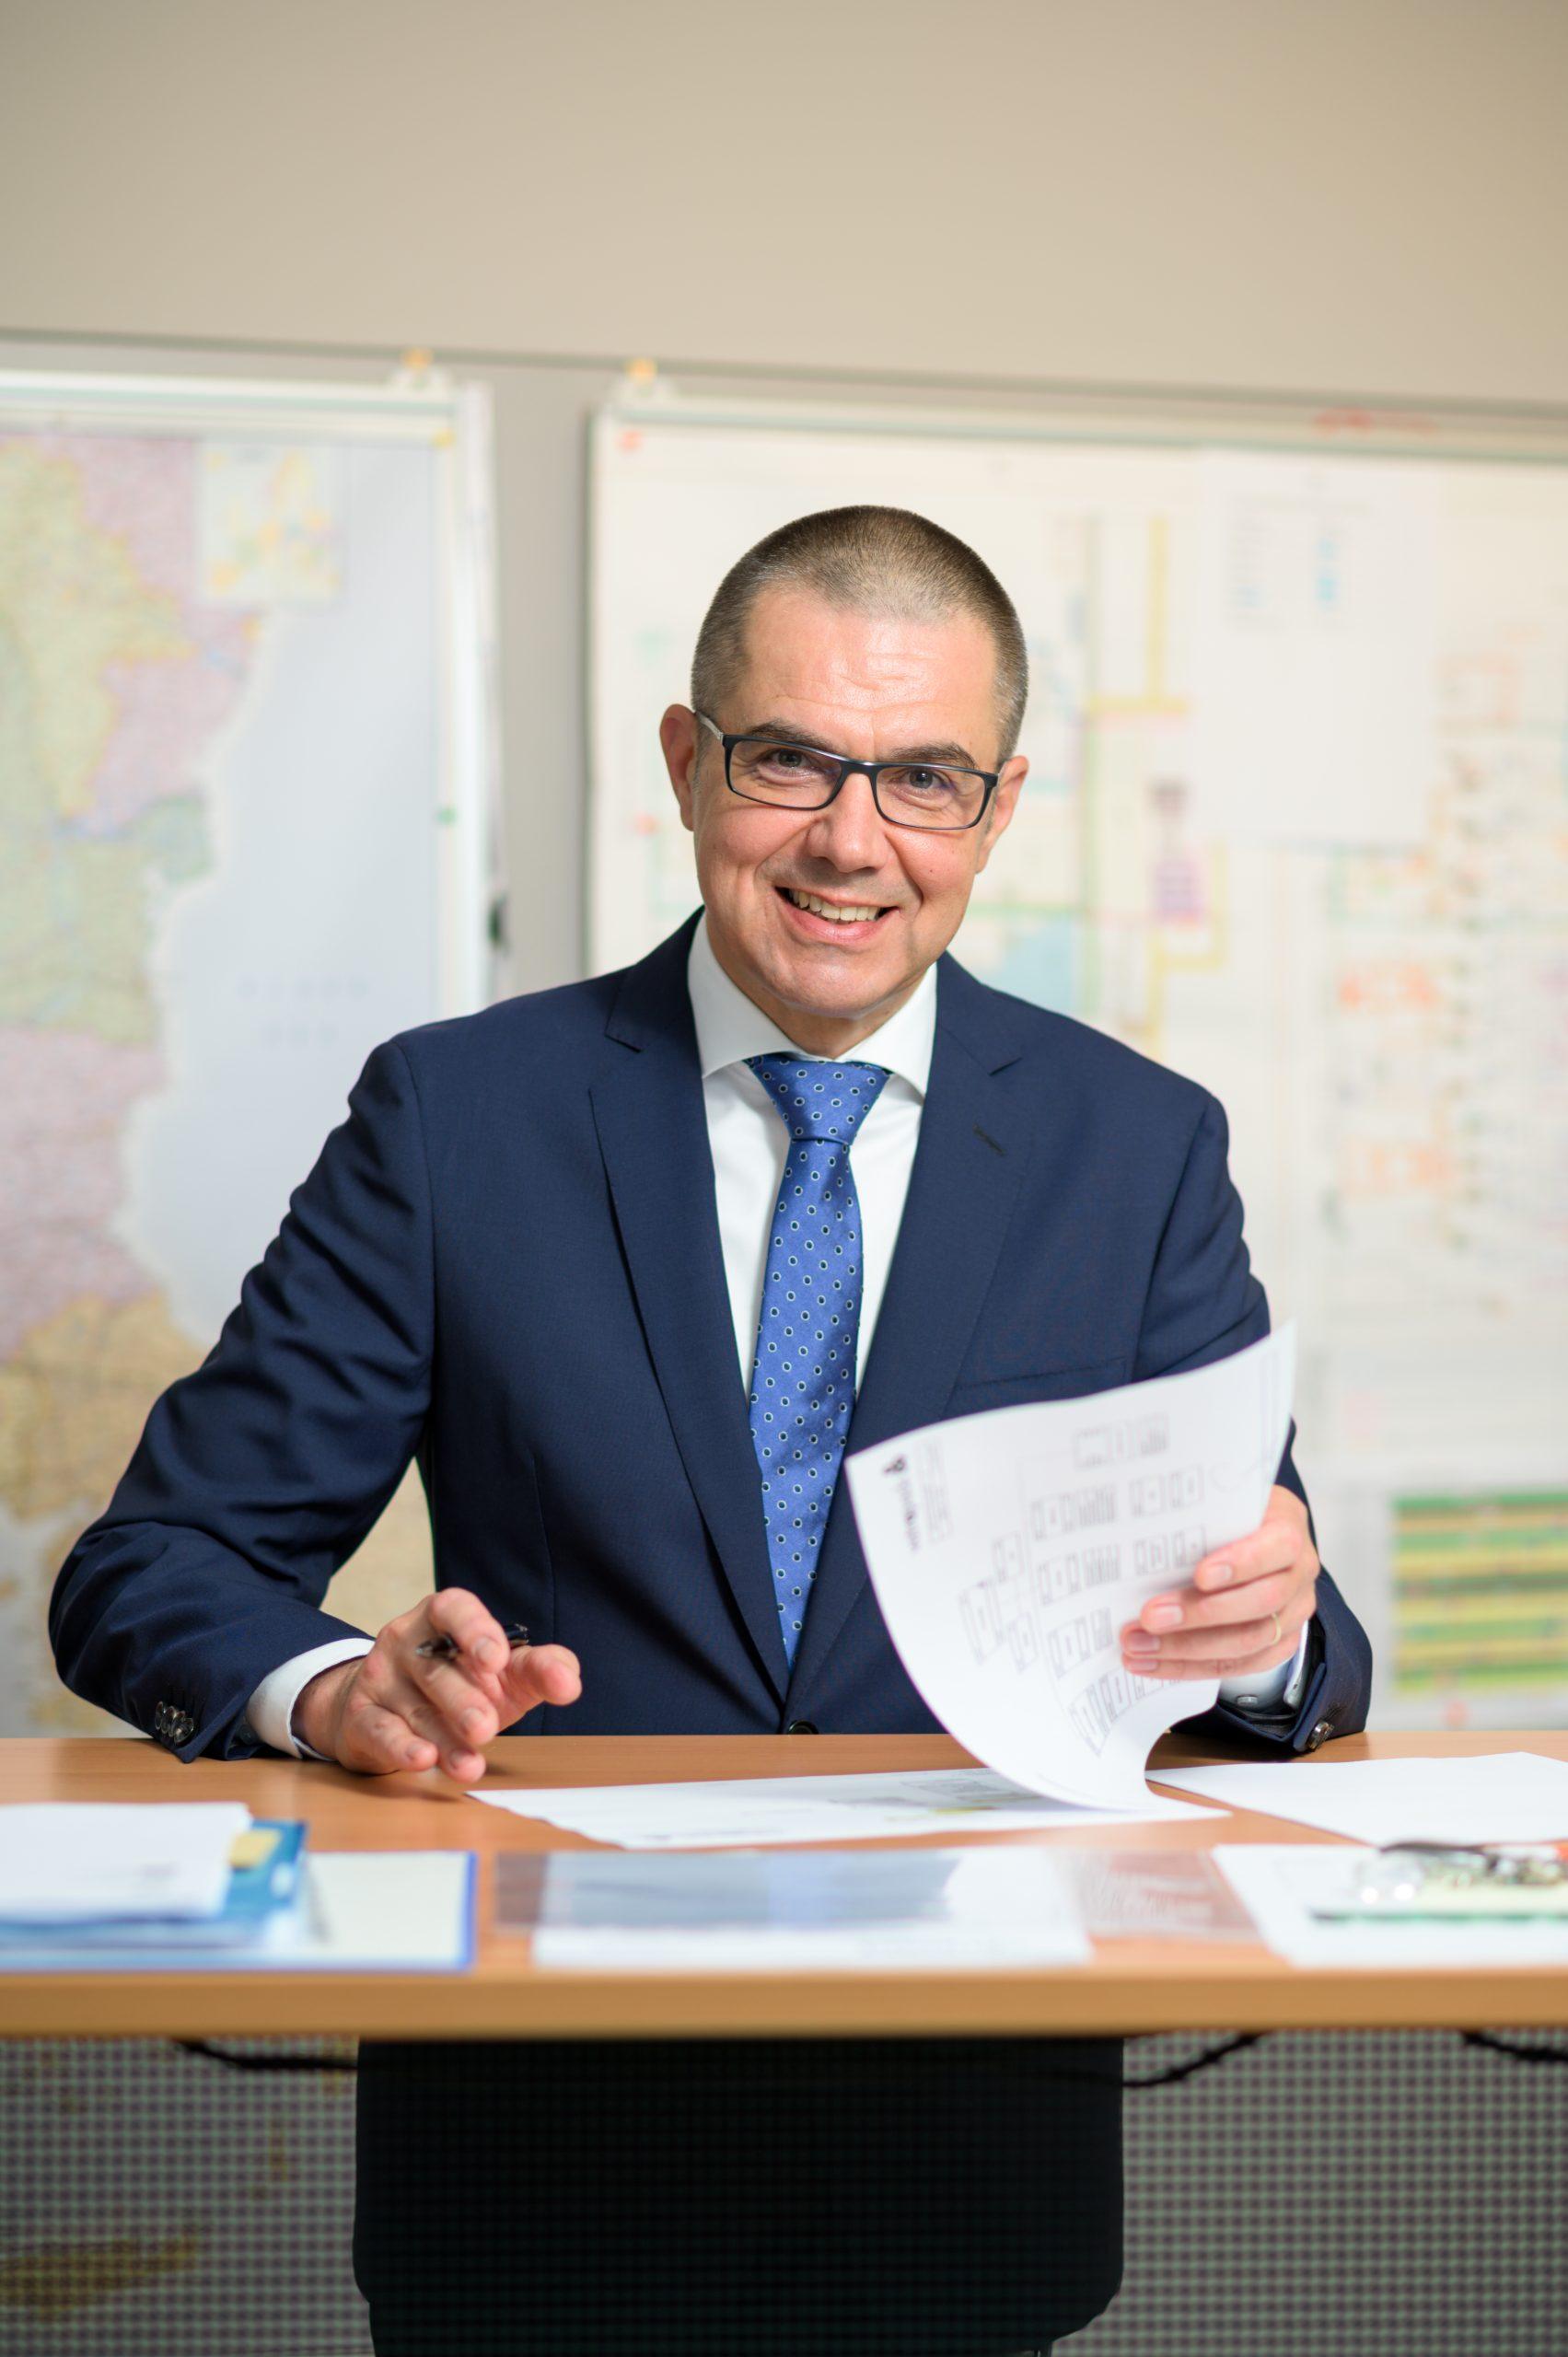 Tihomir Premužak, CEO, Vetropack Straža 1 - hrpsor Hrvatski poslovni savjet za održivi razvoj